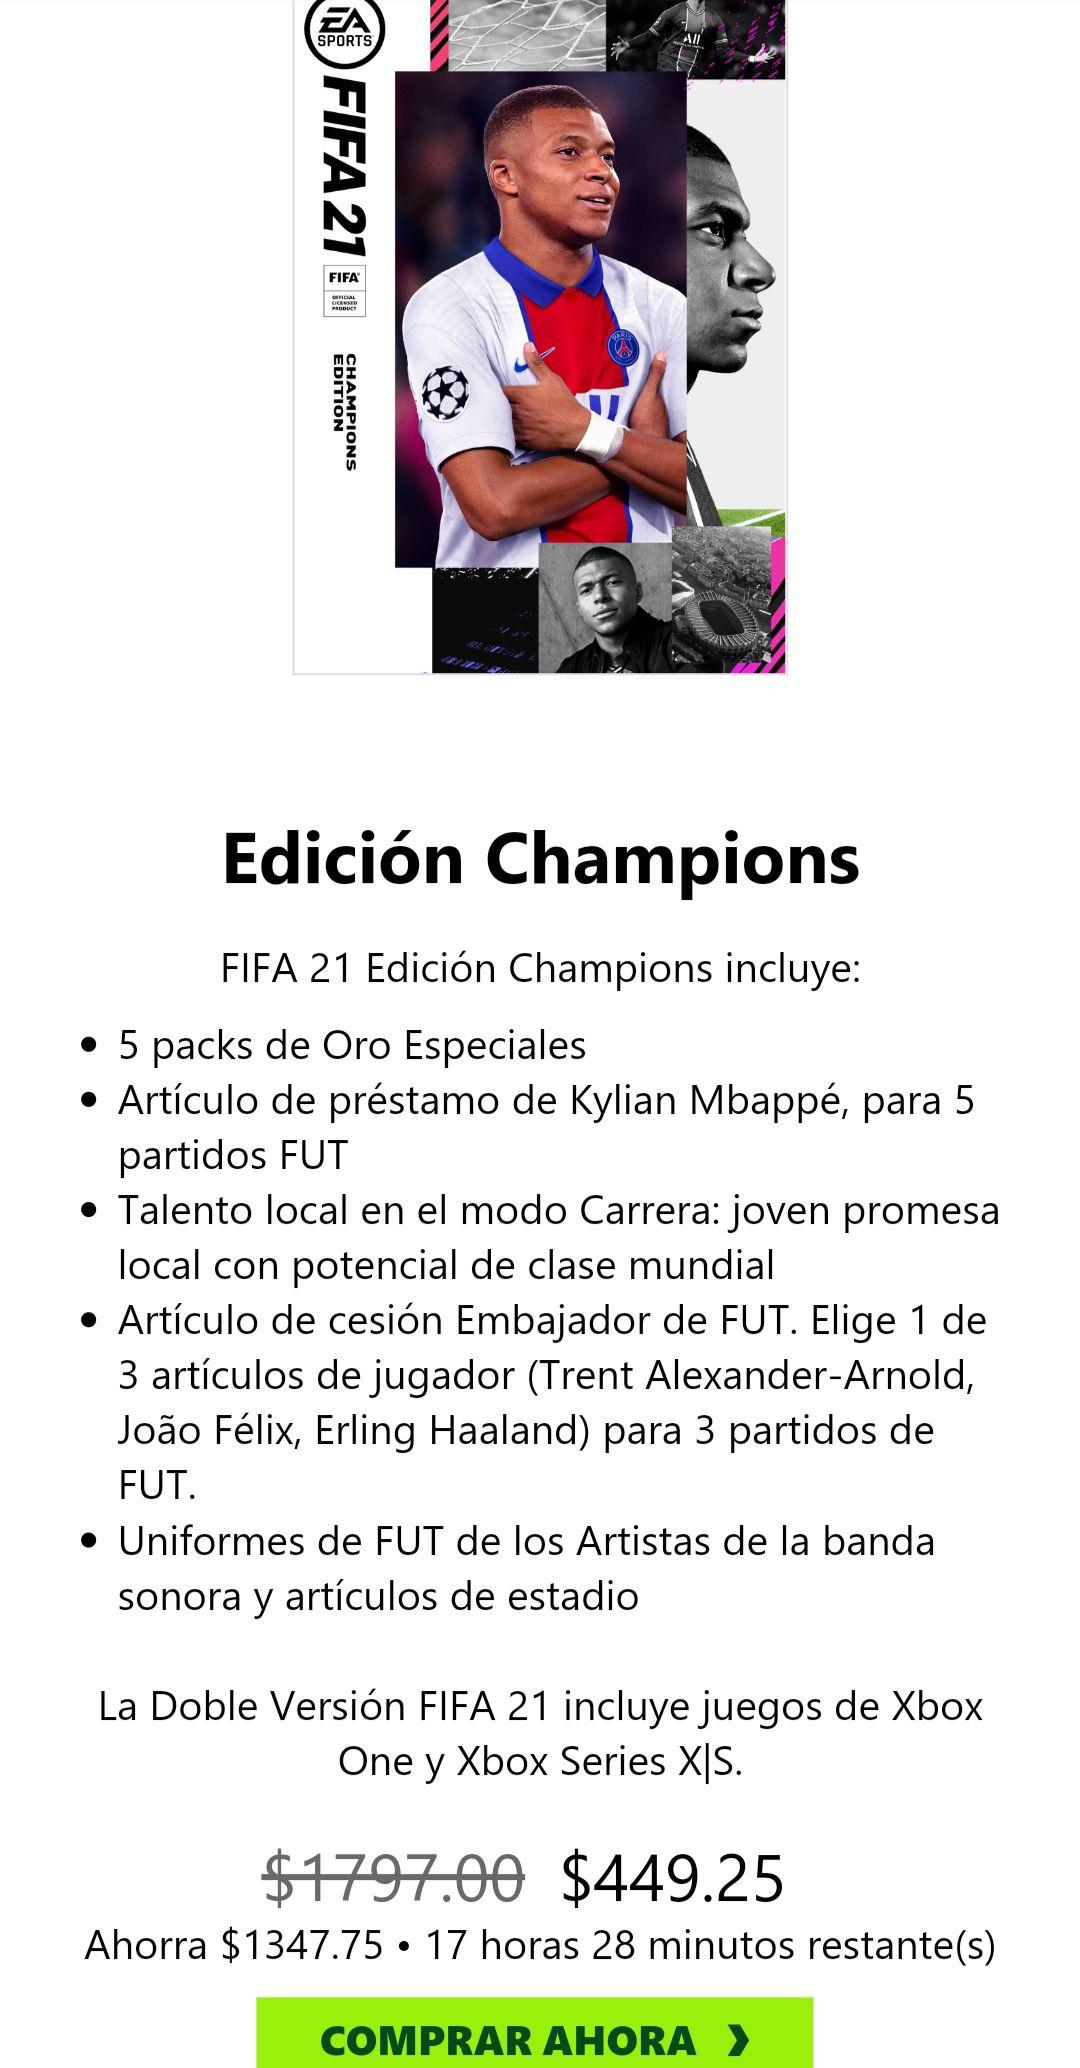 Microsoft Store: FIFA 21 edición champions